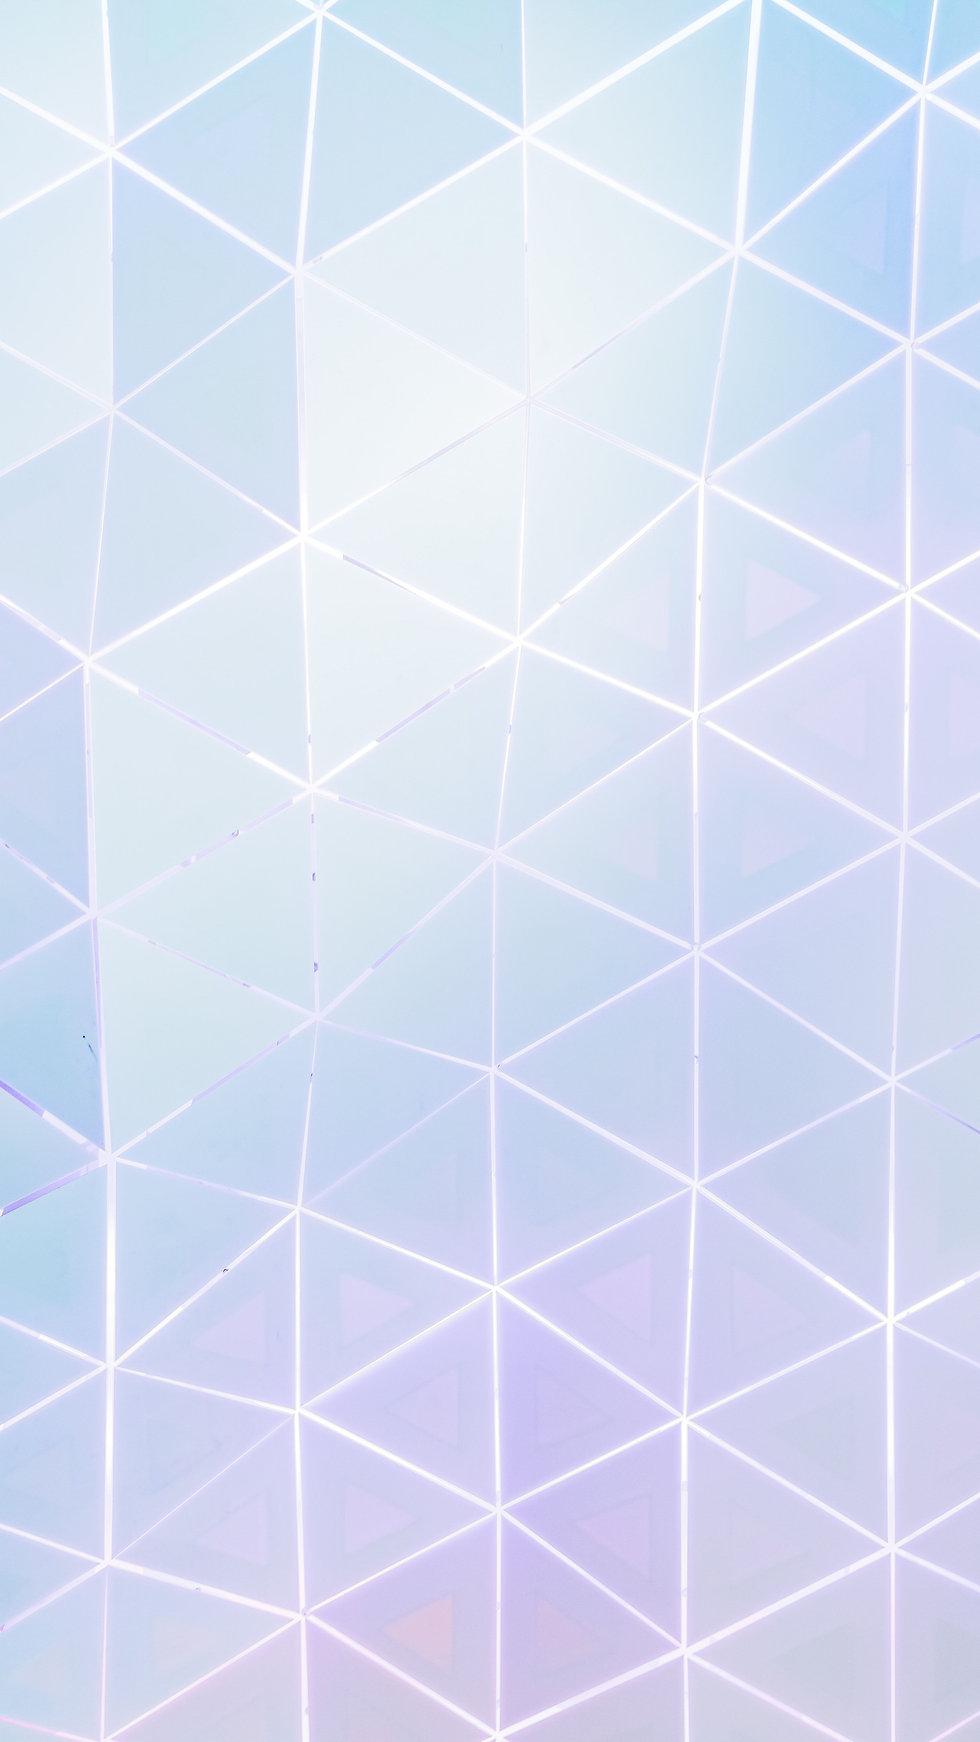 PPT Background Photo - Unsplash.jpg